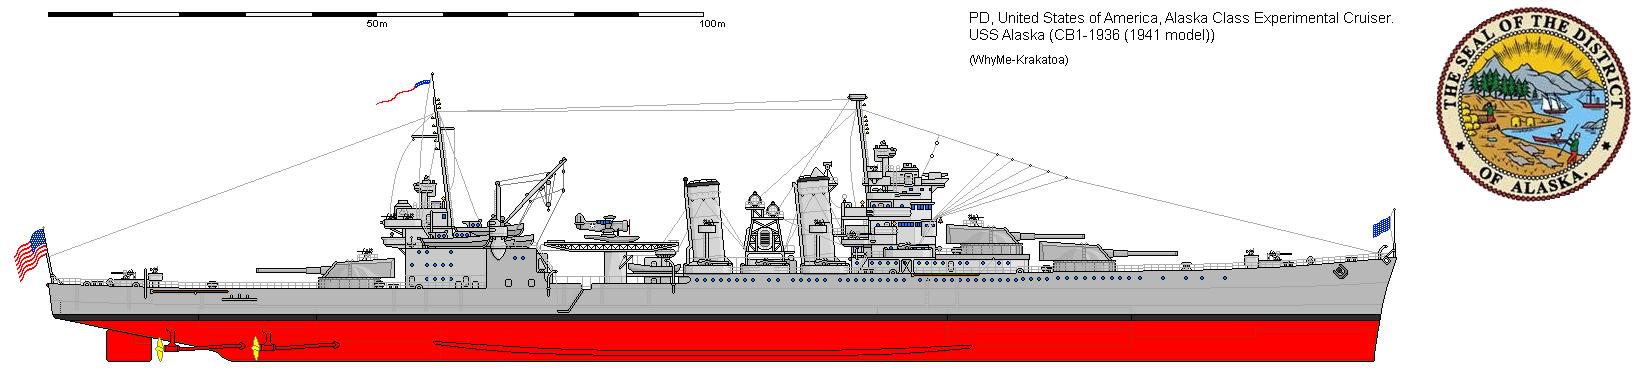 PD_USS_Alaska_(CB1-1936).png